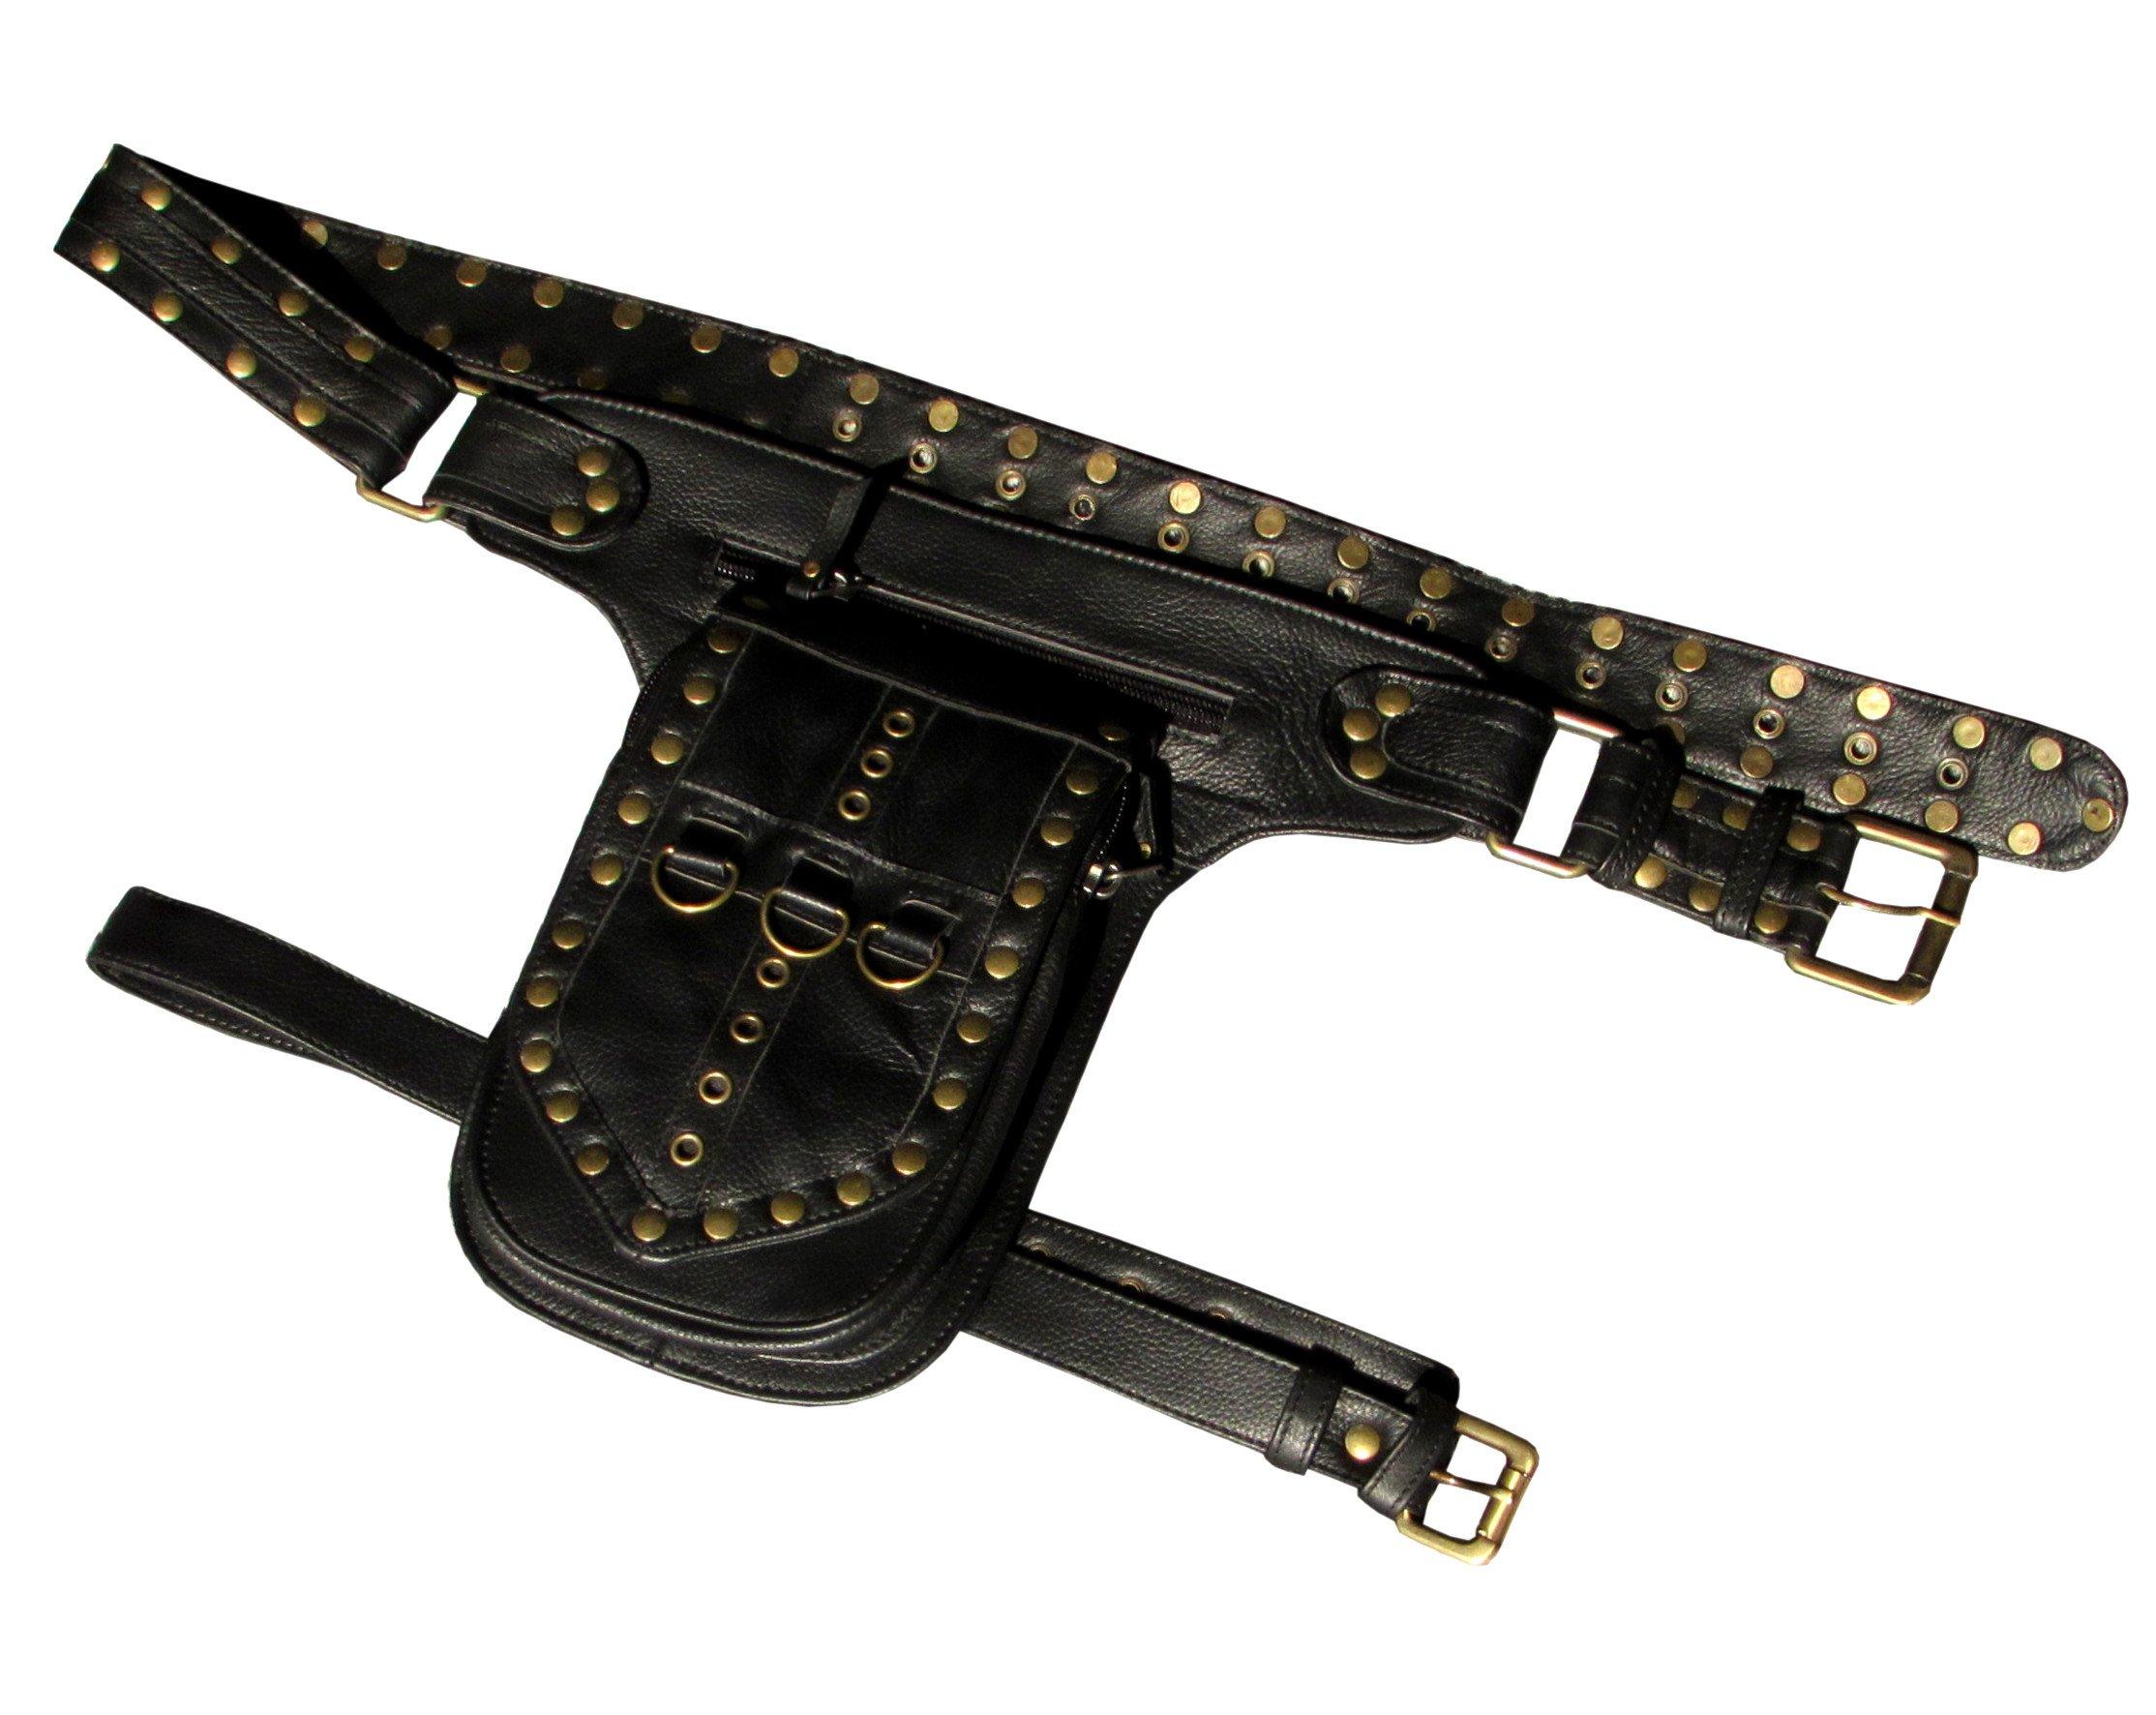 One Leaf Leather Leg Holster Utility Belt Thigh Bag (Black)